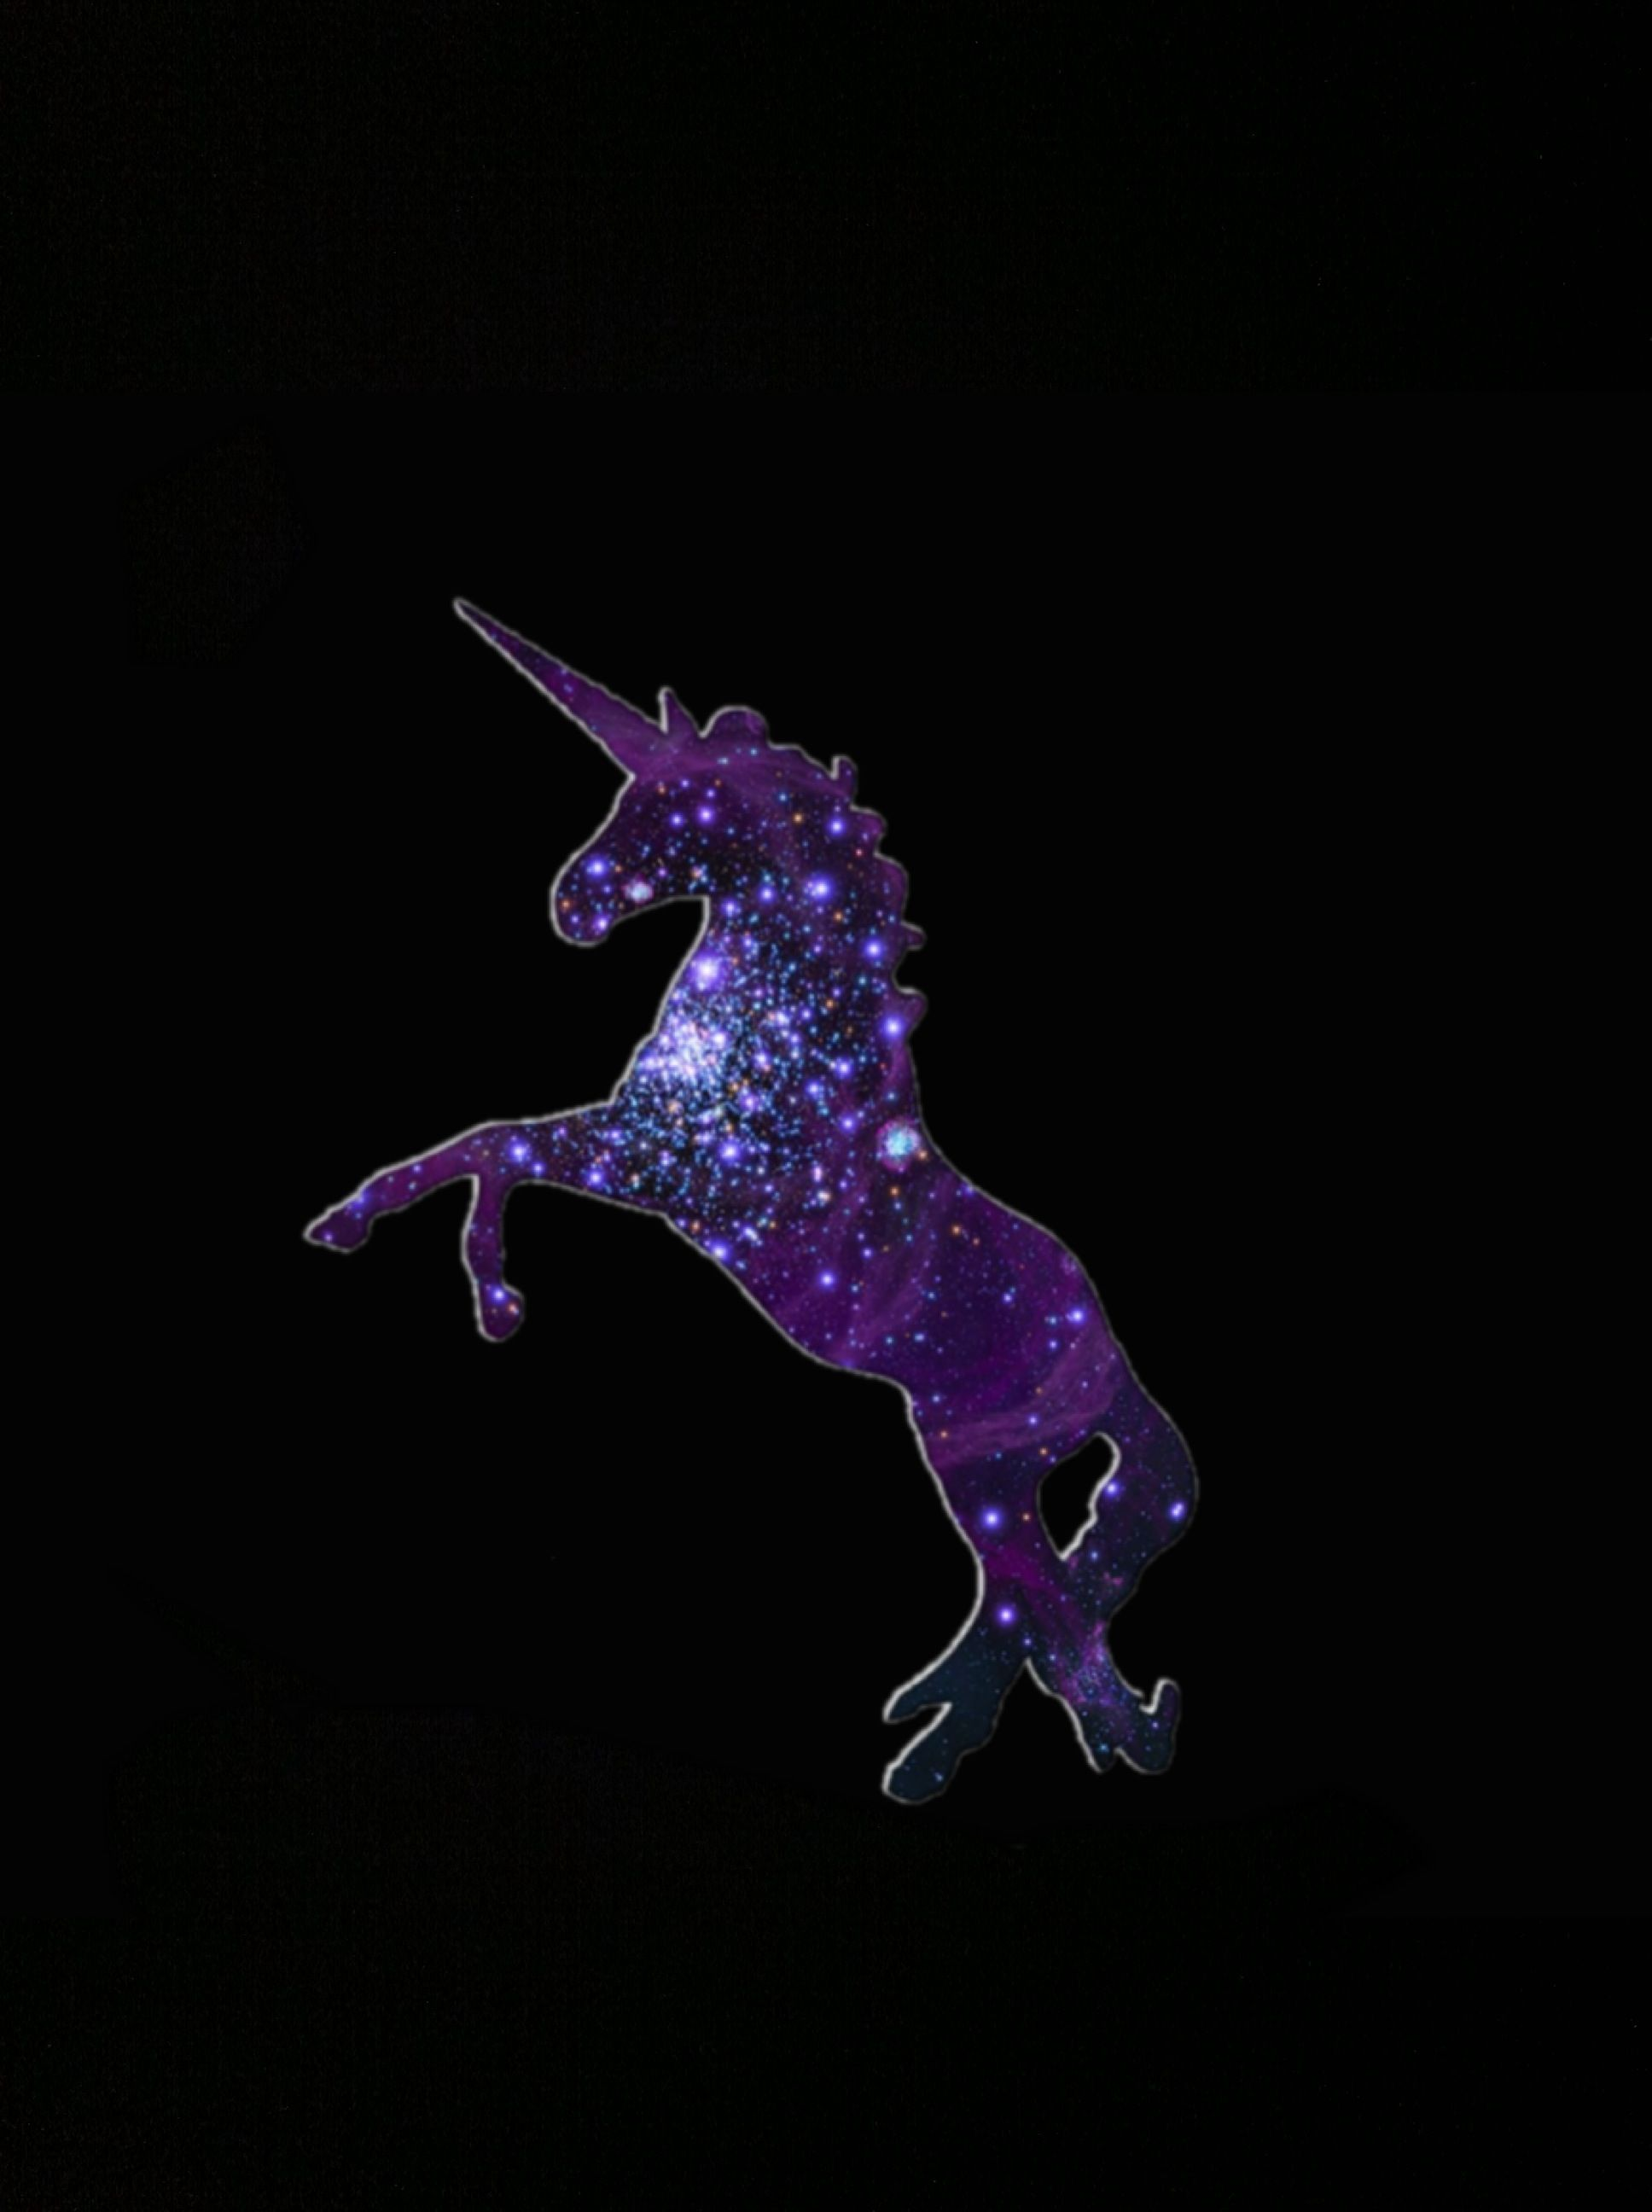 Unicorn galaxy background | iPod/iPhone Backgrounds | Tumblr wallpaper, Unicorn, Horse wallpaper